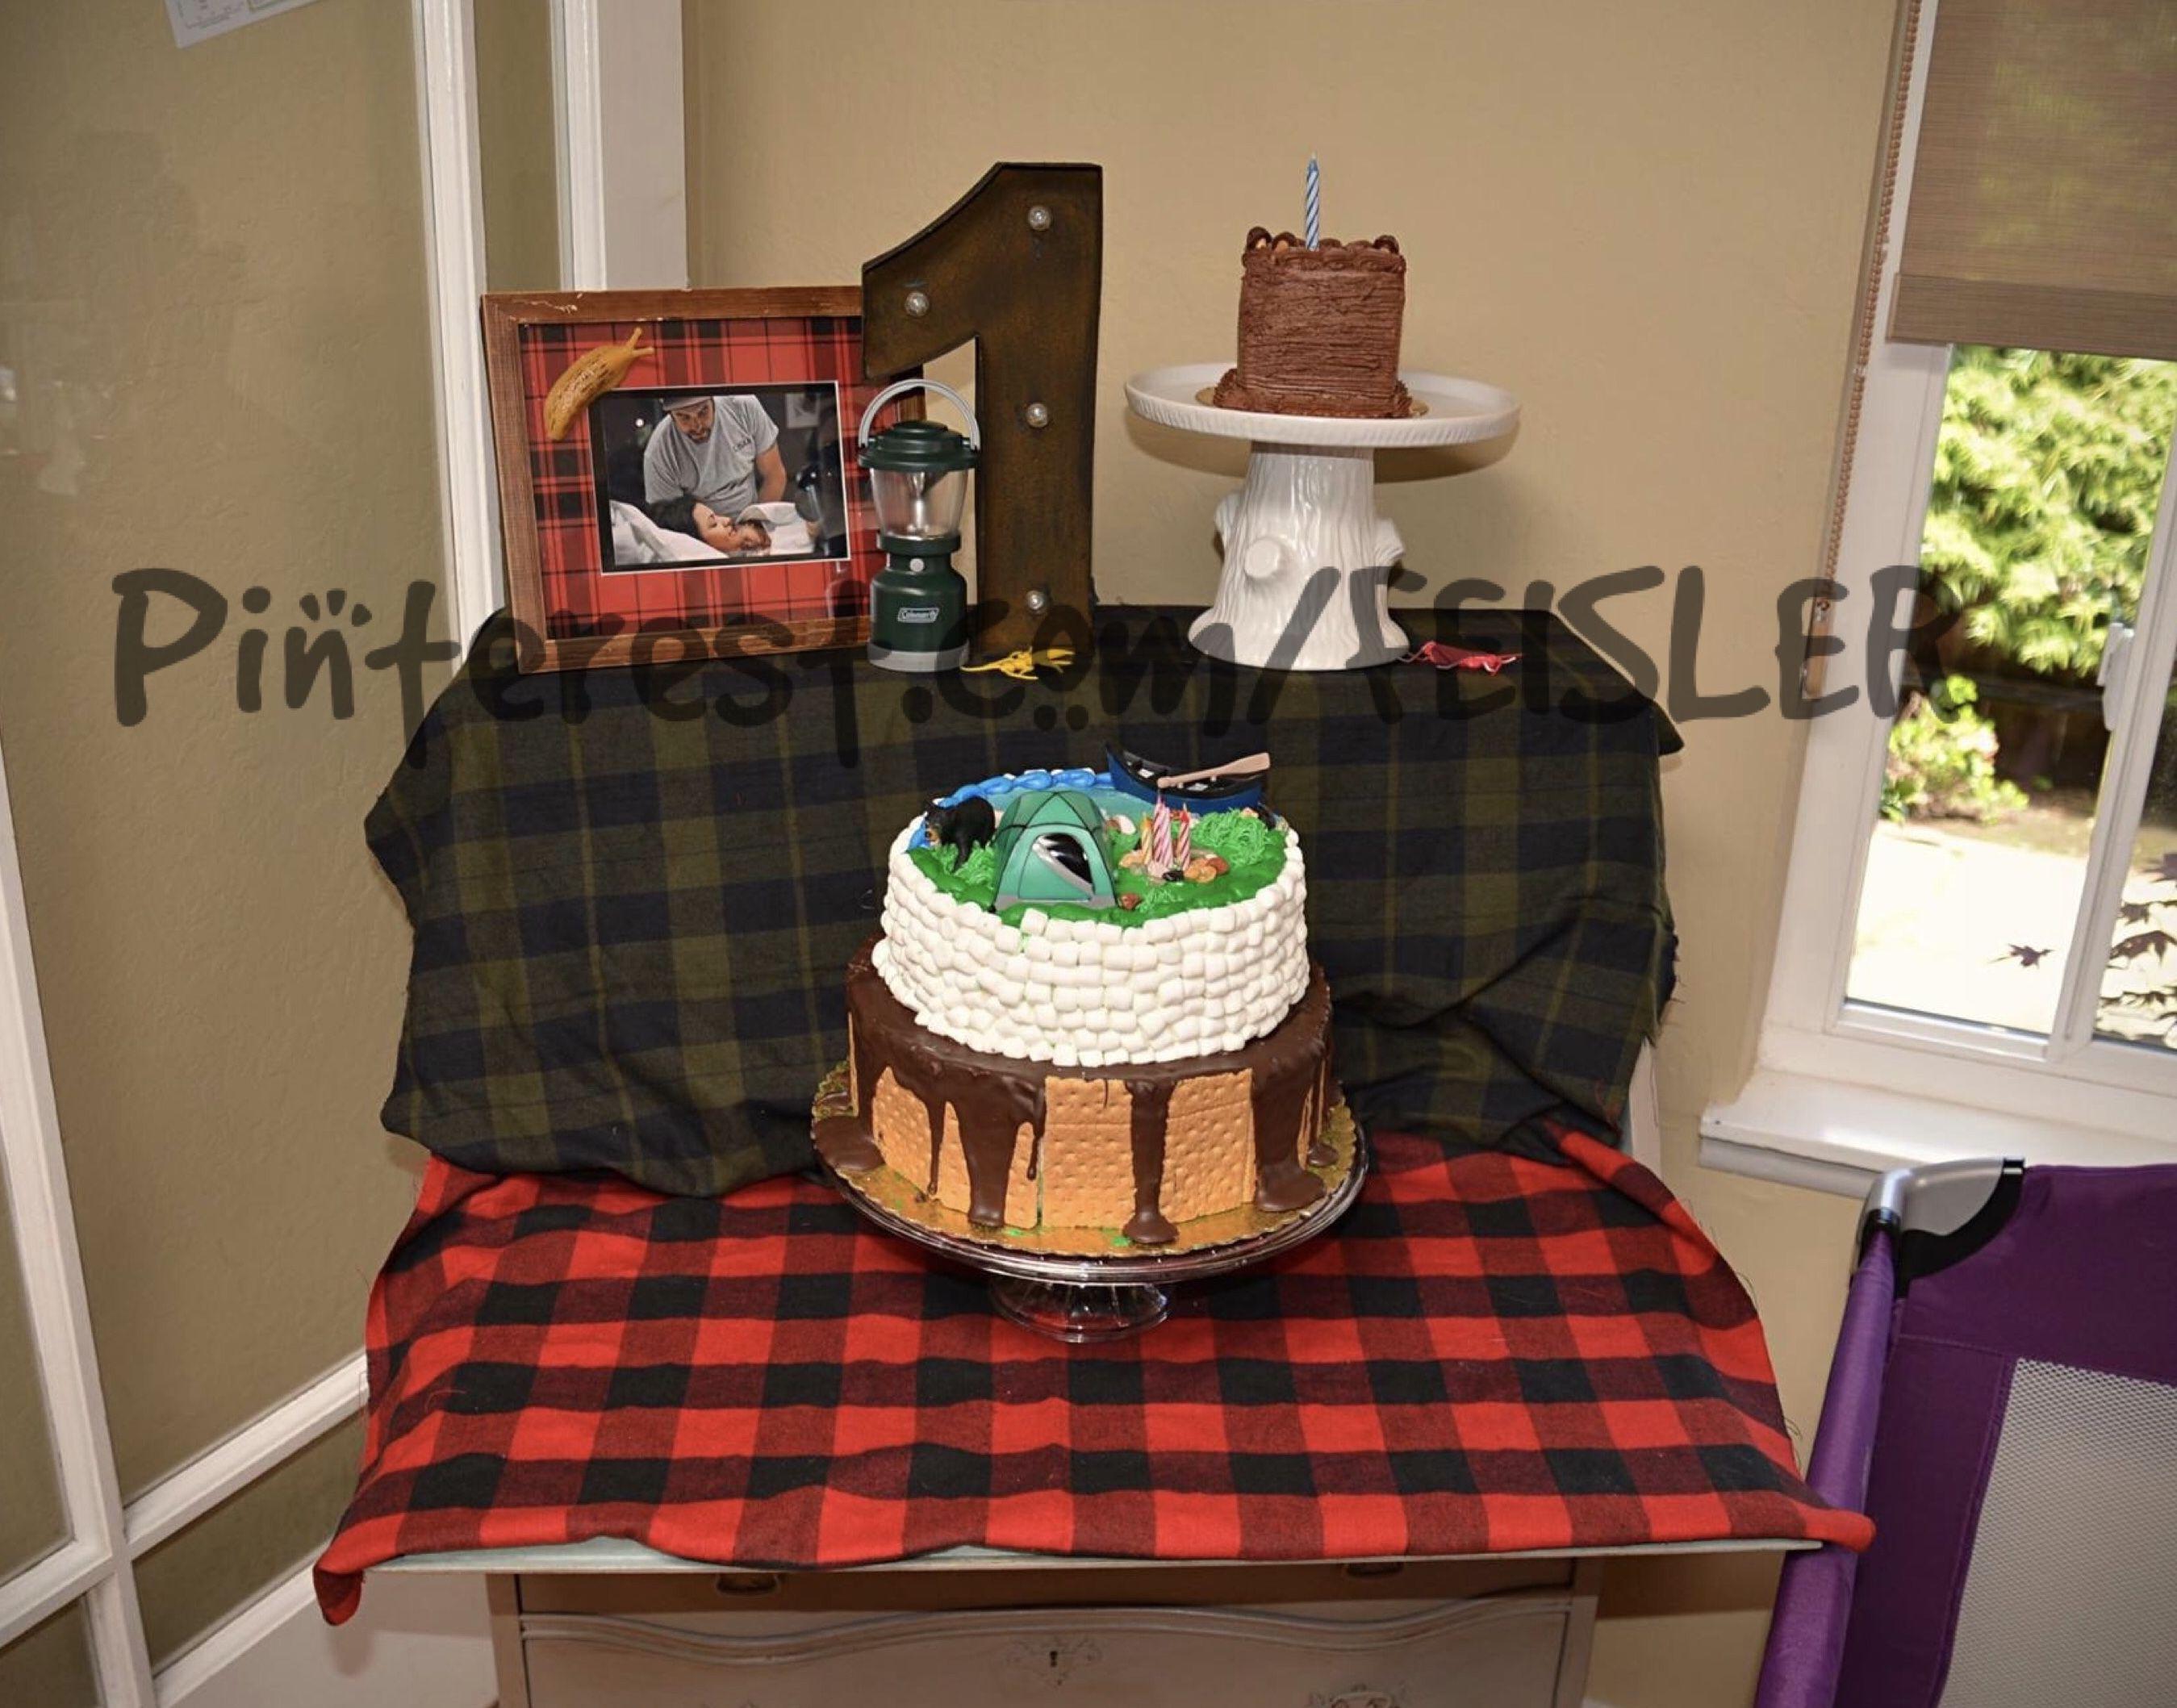 Camping Lumberjack Nature Woods Birthday Party Theme Decoration Idea Cake Display Table Smores Buffalo Plaid